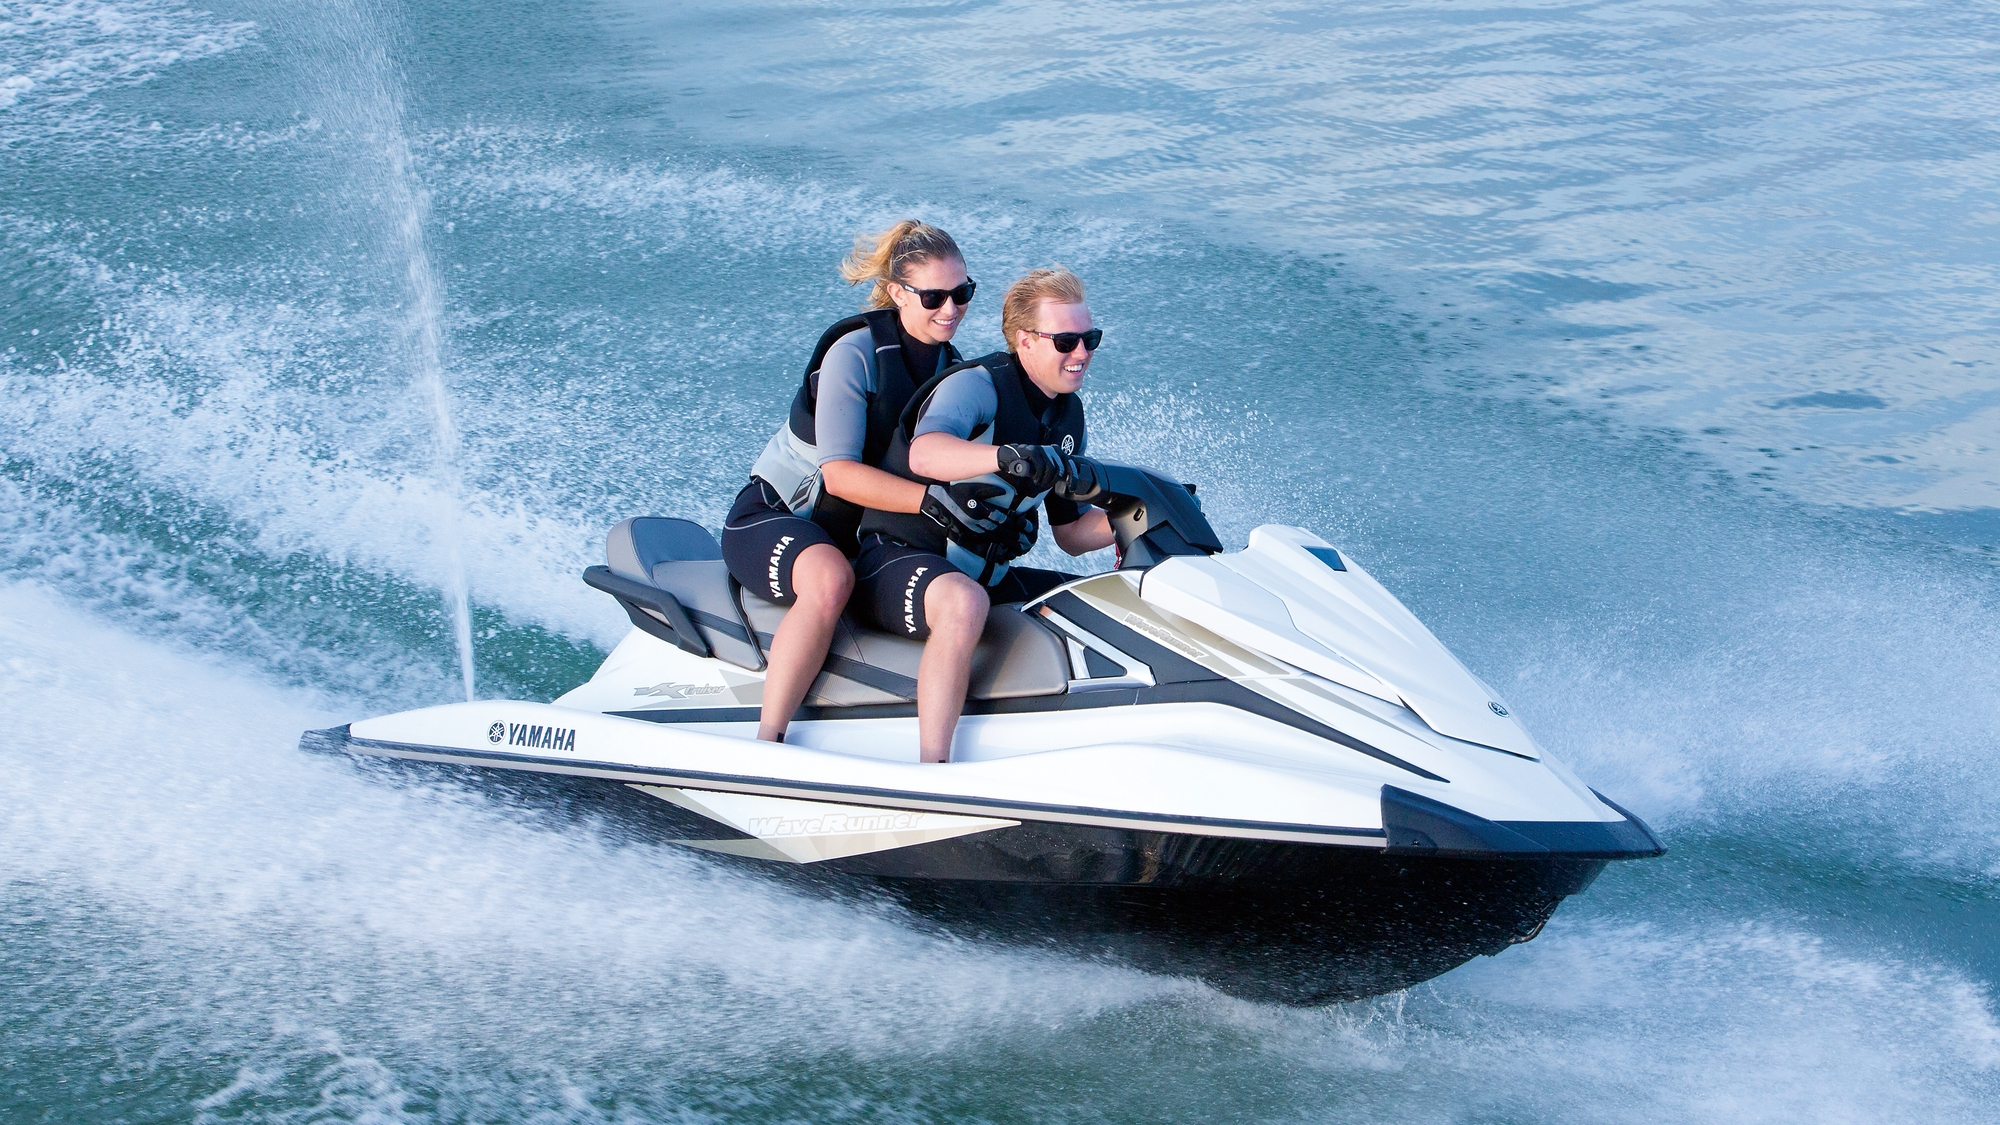 VX Cruiser 2015 Waverunners Yamaha Motor Scandinavia